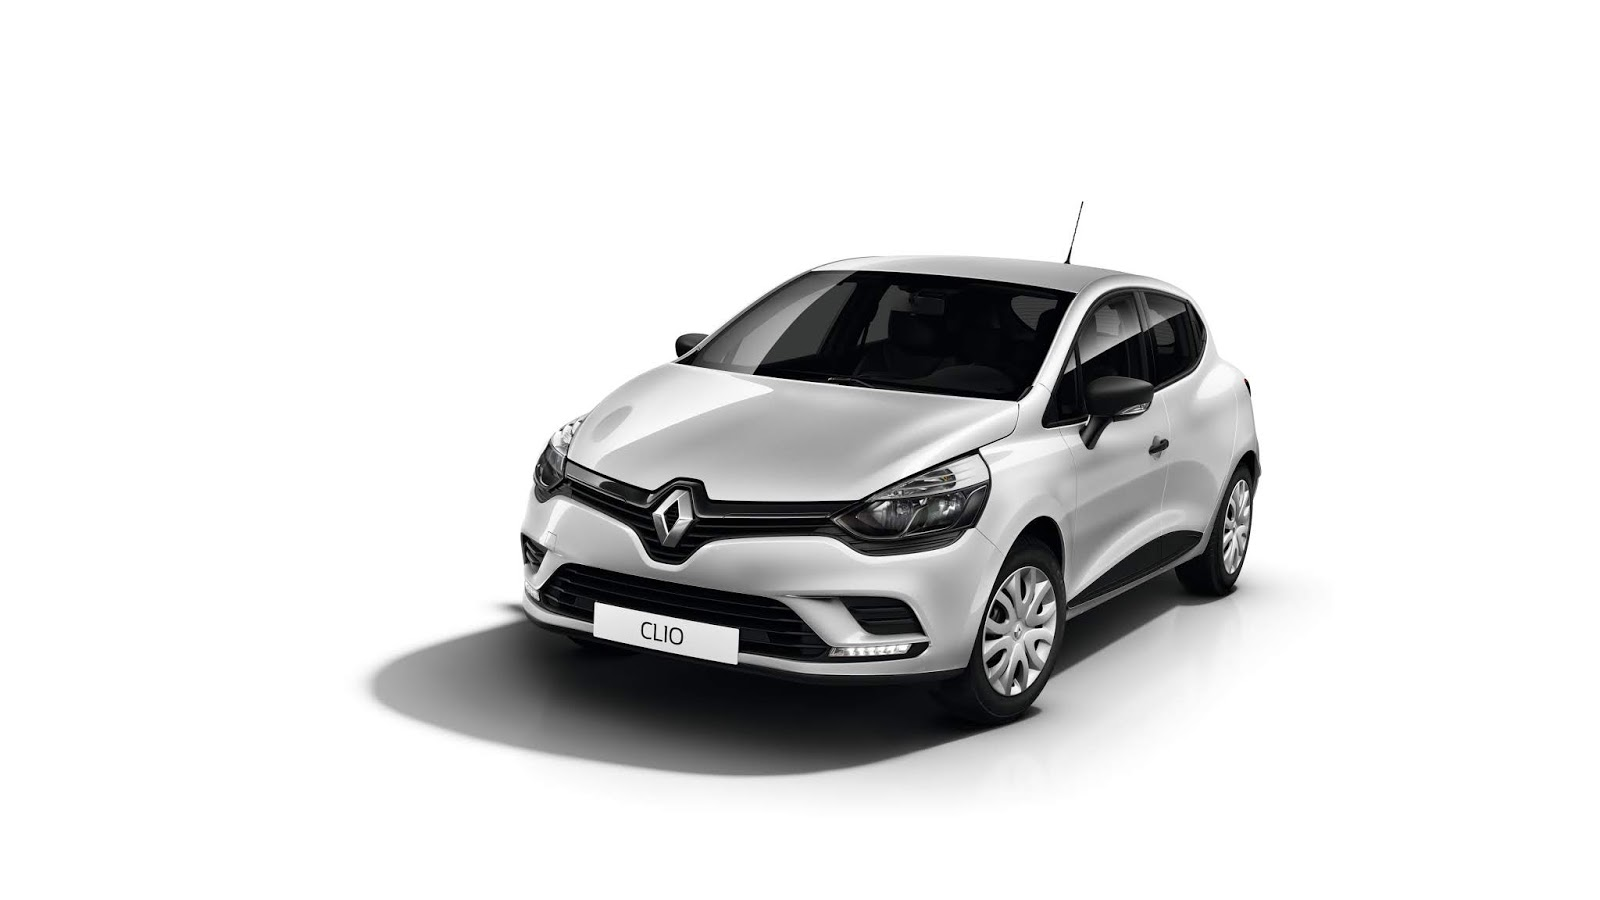 clio2Bvan Ρεκόρ πωλήσεων για τα επαγγελματικά της Renault στην Ελλάδα Renault, Renault Clio Business, Renault Kangoo, VAN, Επαγγελματικά